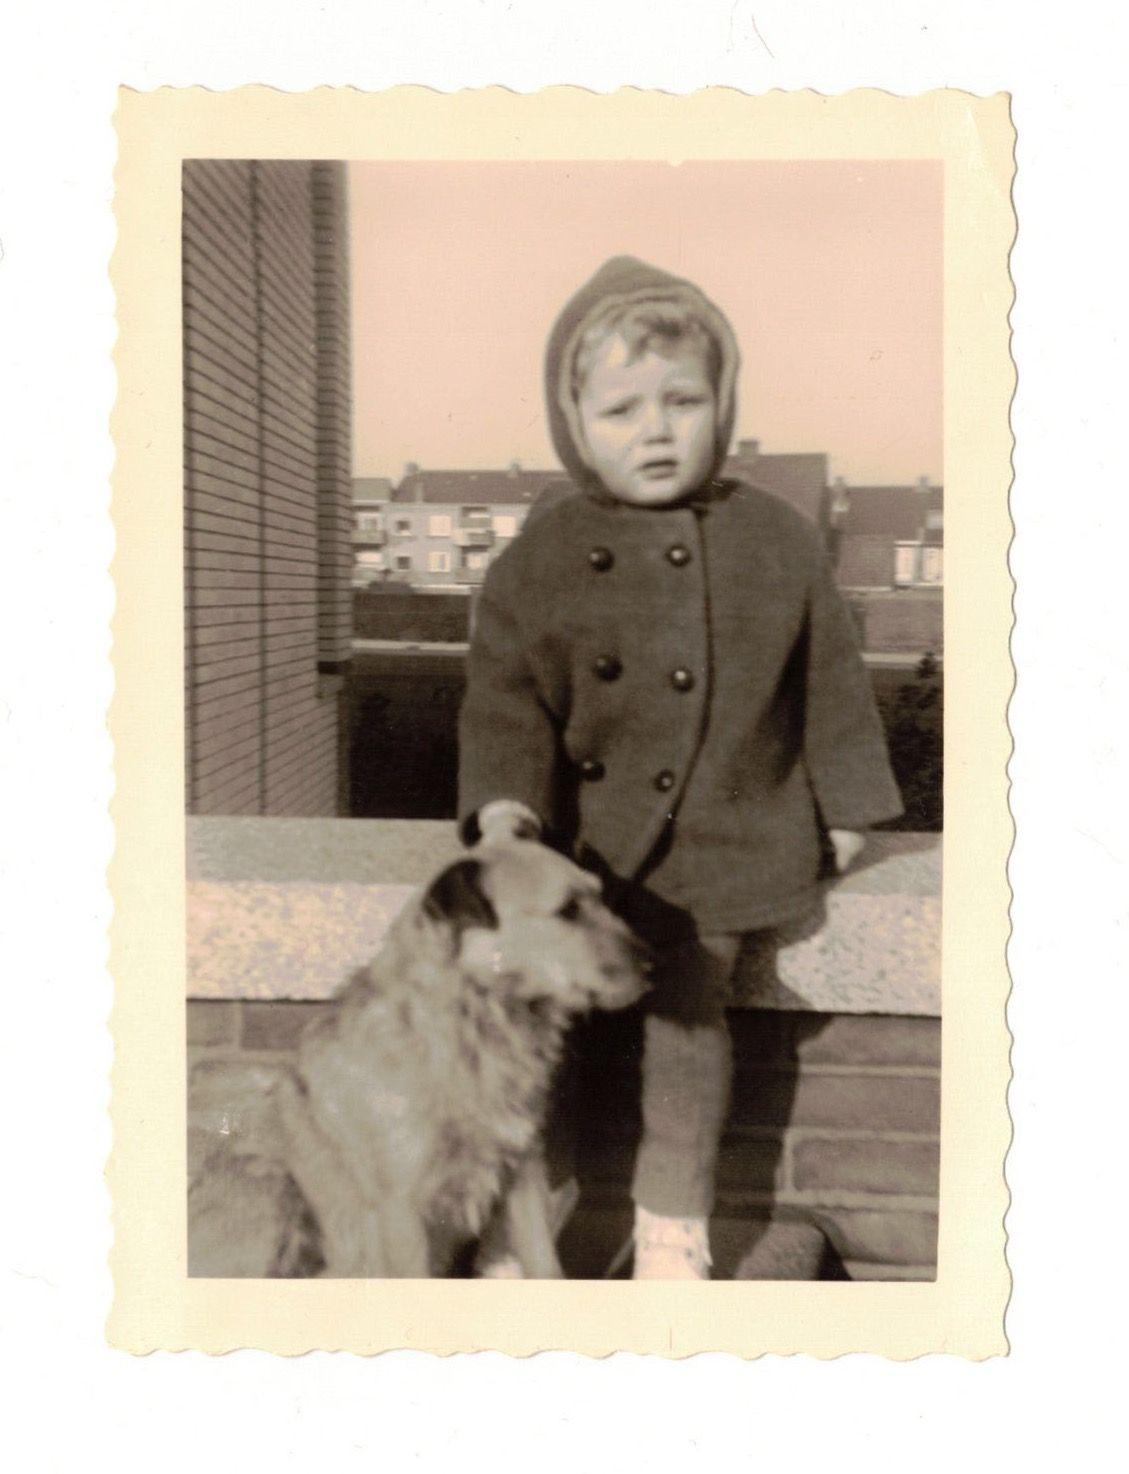 With Leksie, 1960.